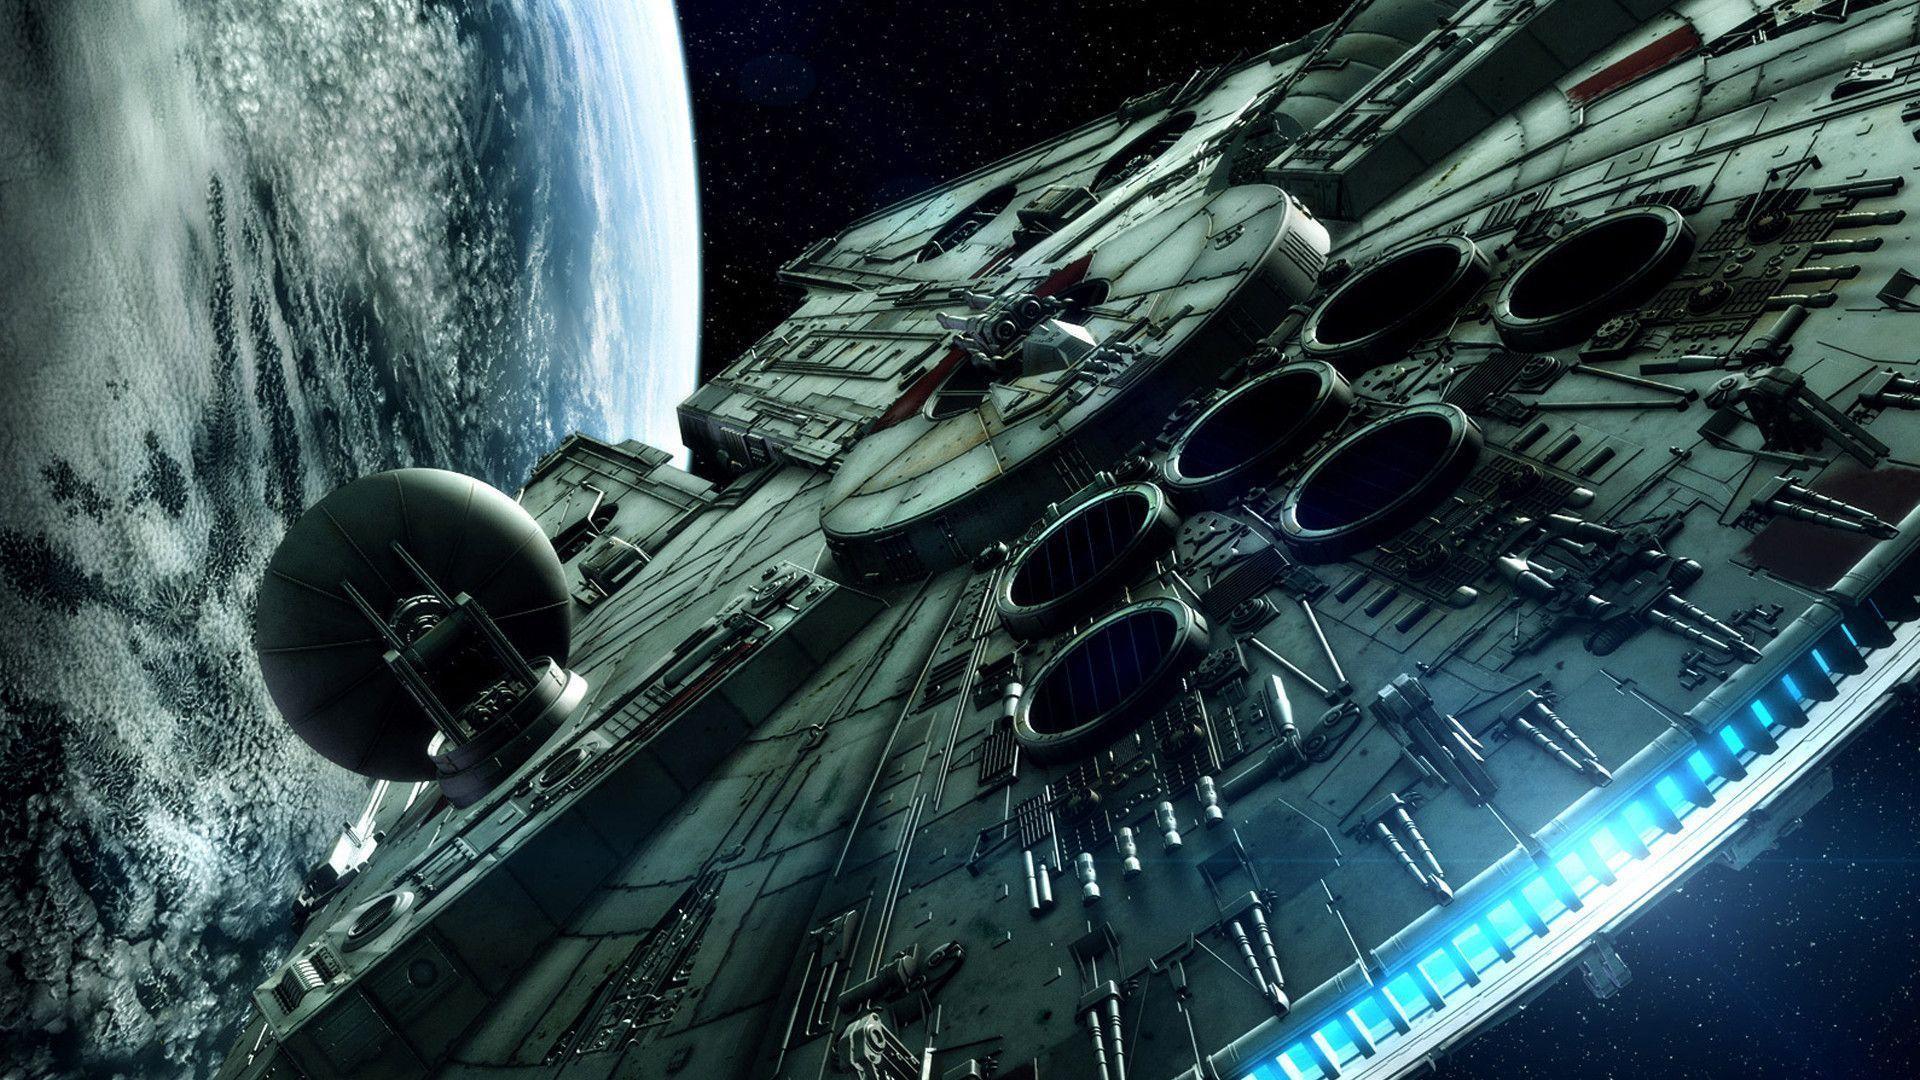 star wars wallpapers 1080p wallpaper cave